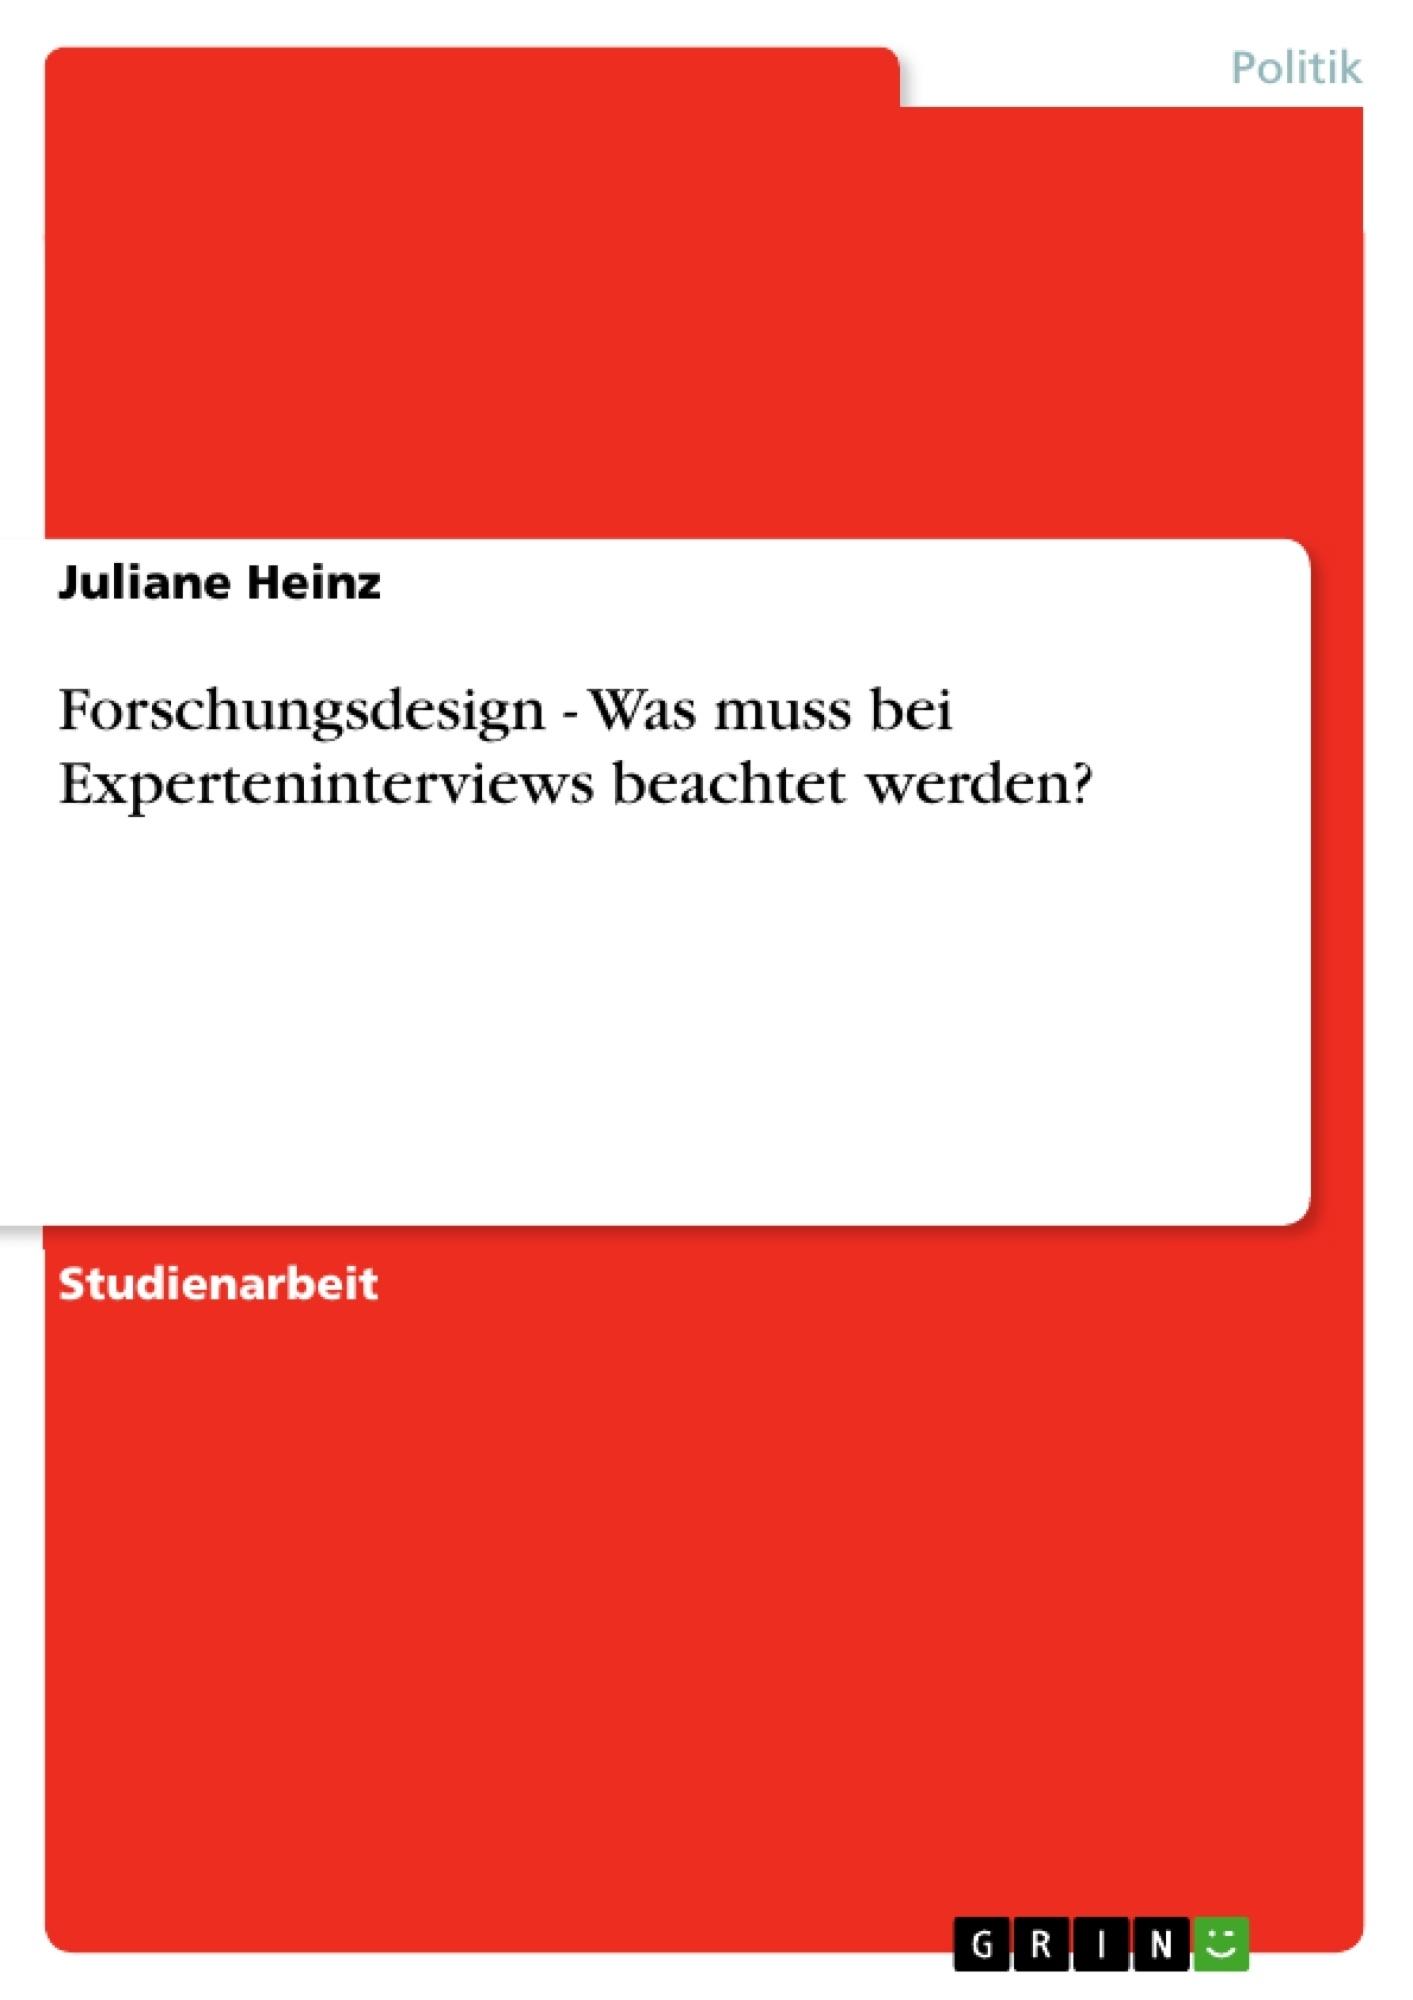 Titel: Forschungsdesign - Was muss bei Experteninterviews beachtet werden?